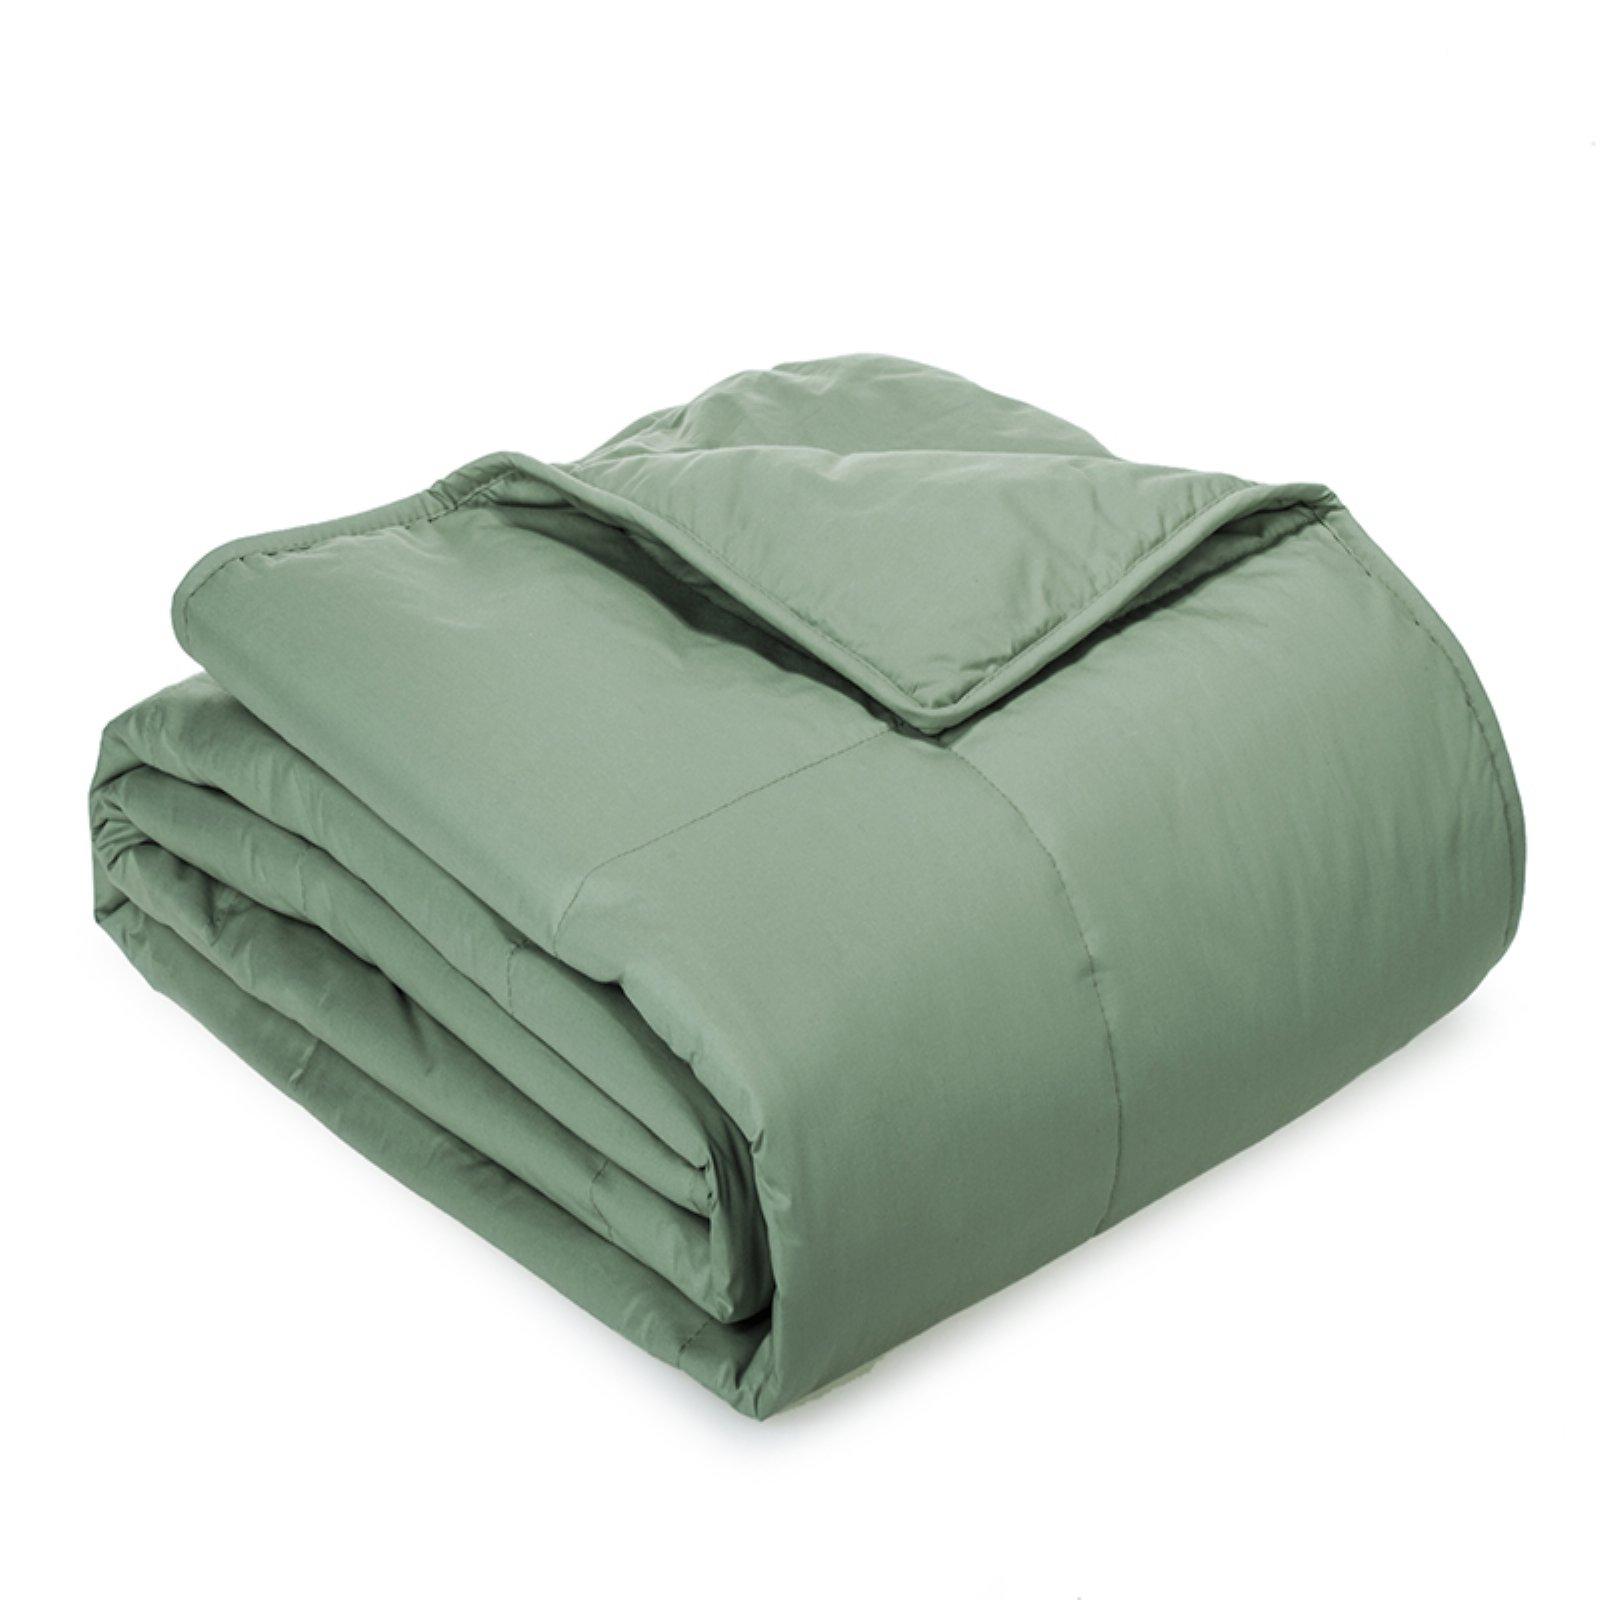 Twin Cottonloft Soft All Natural Breathable Cotton Comforter, Black